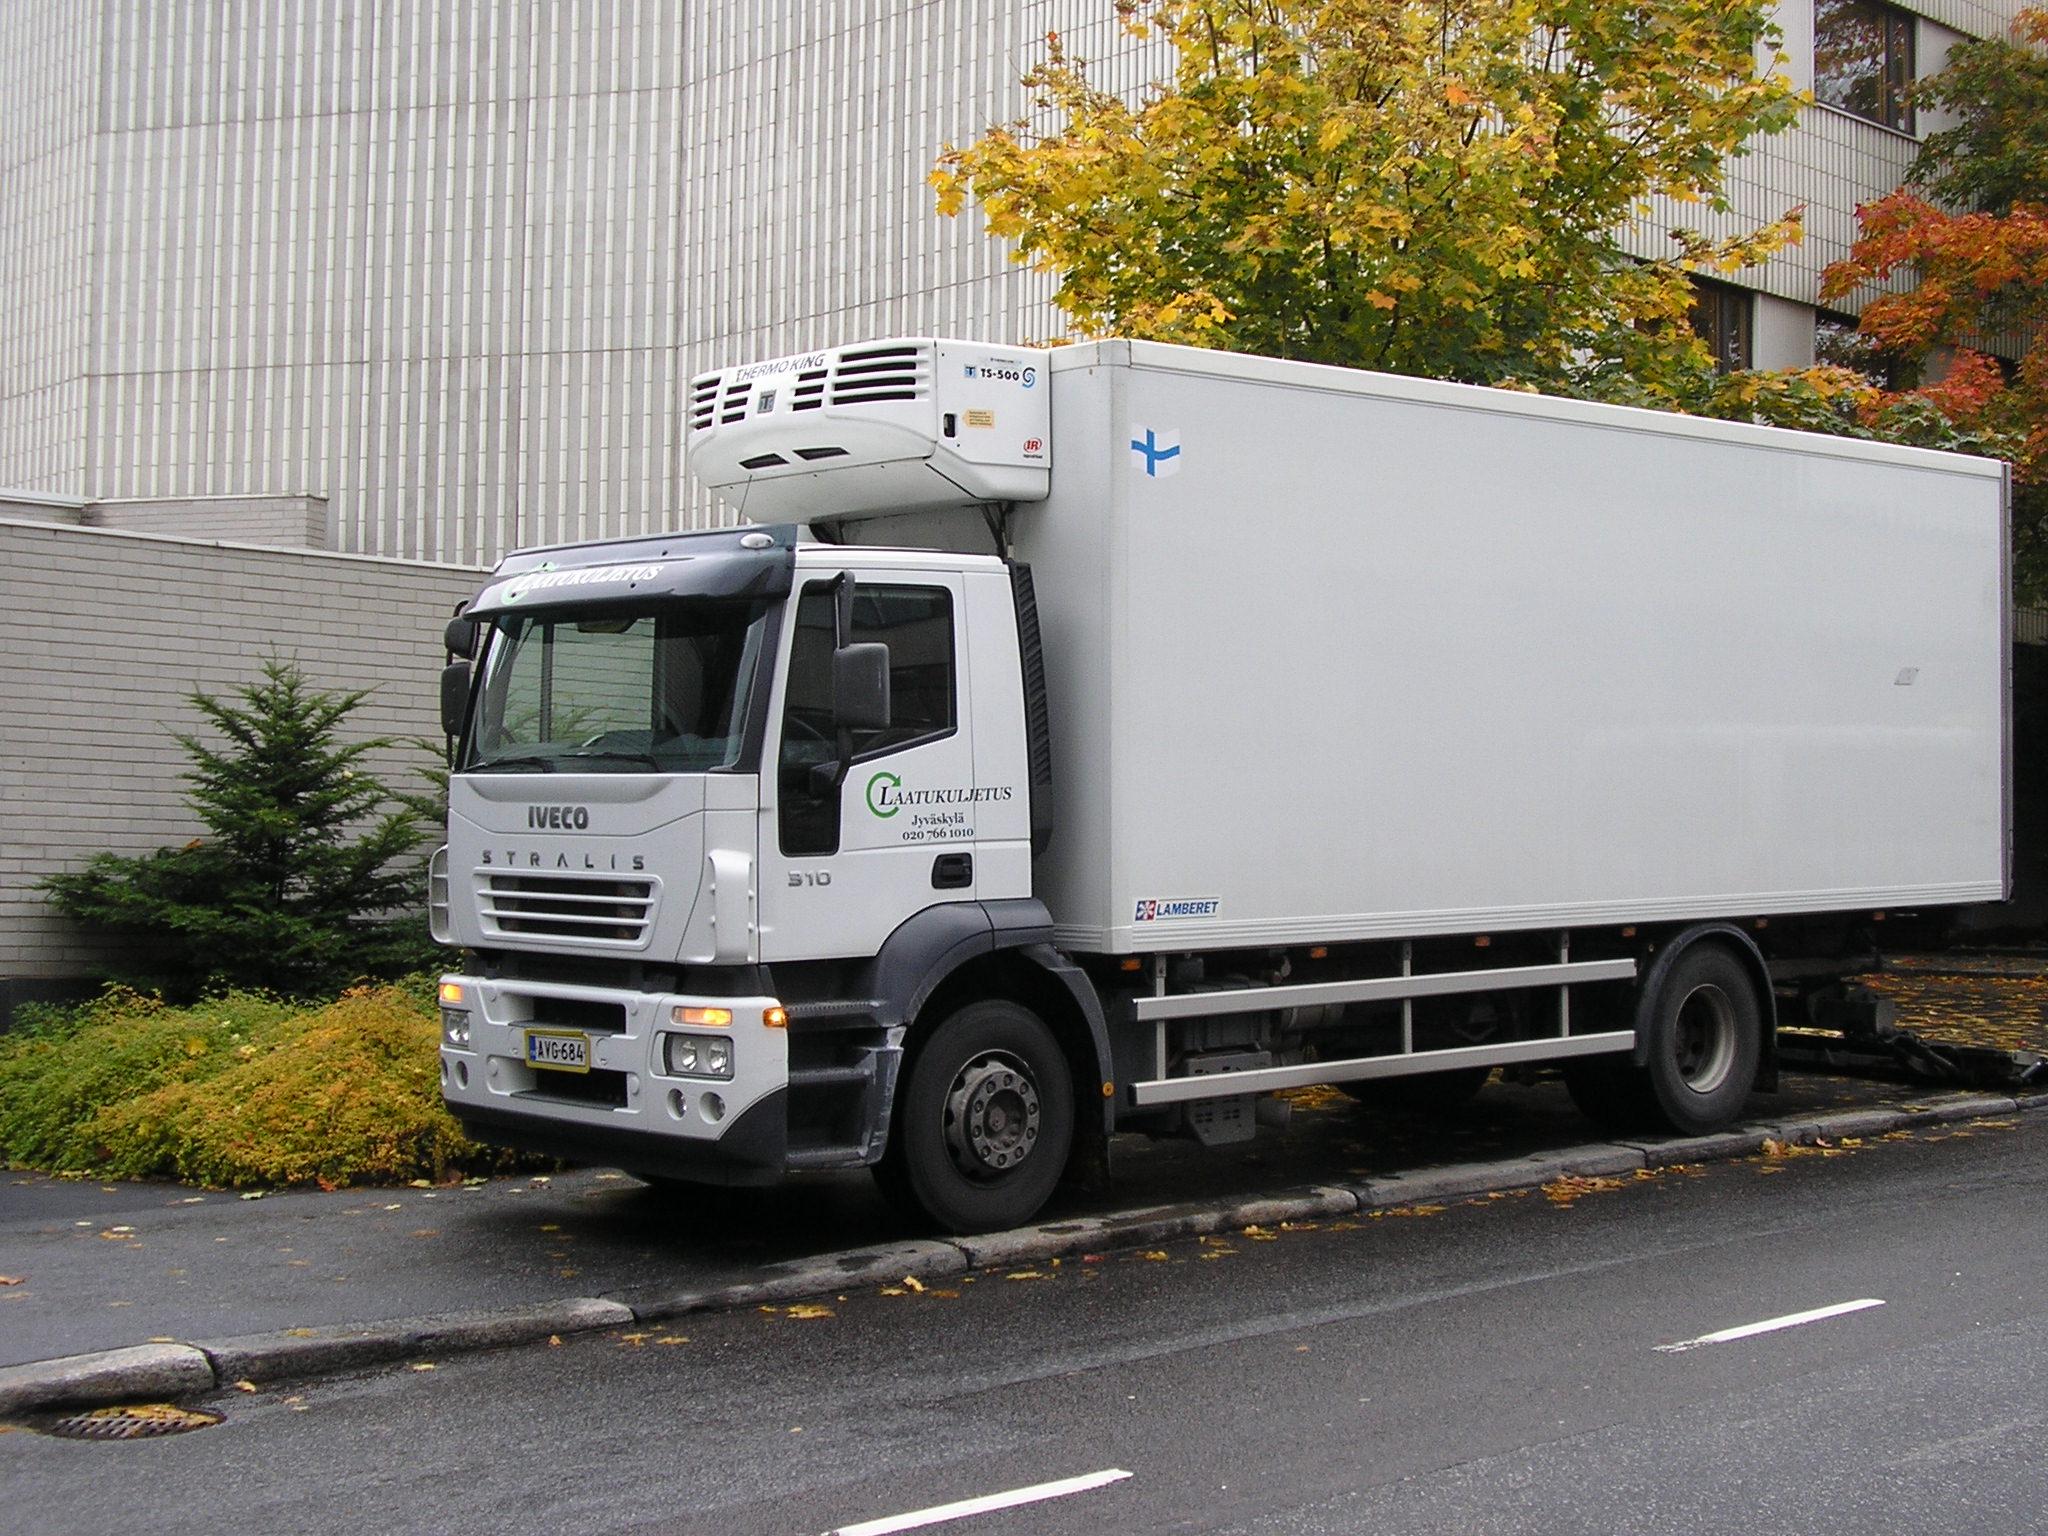 File:Iveco Stralis truck in Jyväskylä.jpg - Wikimedia Commons